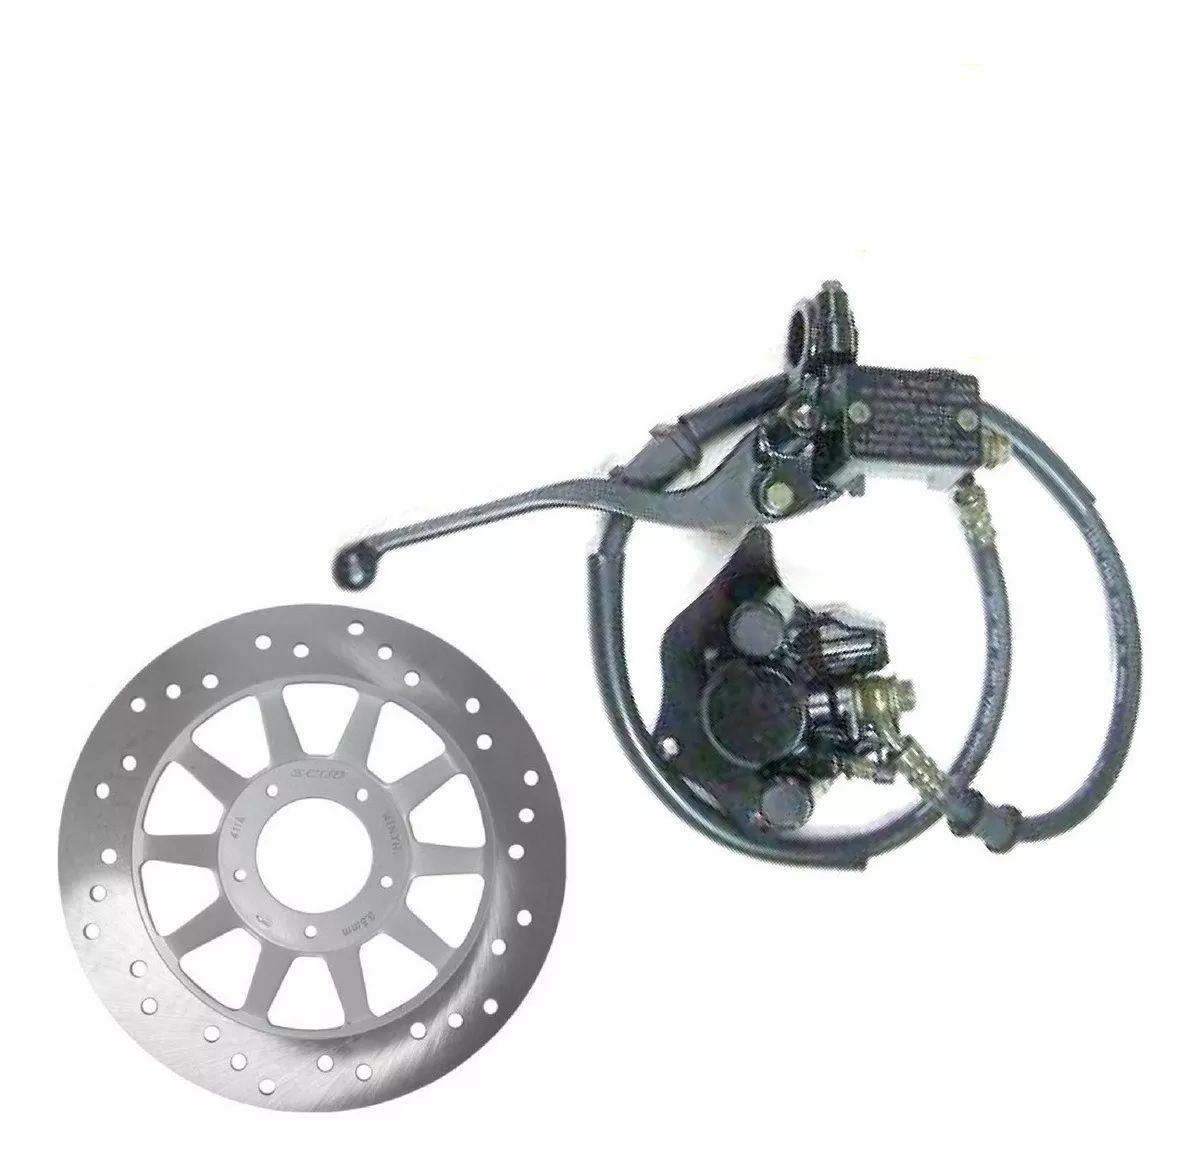 Kit Sistema para Freio a Disco Honda Titan Fan 150 04 a 08